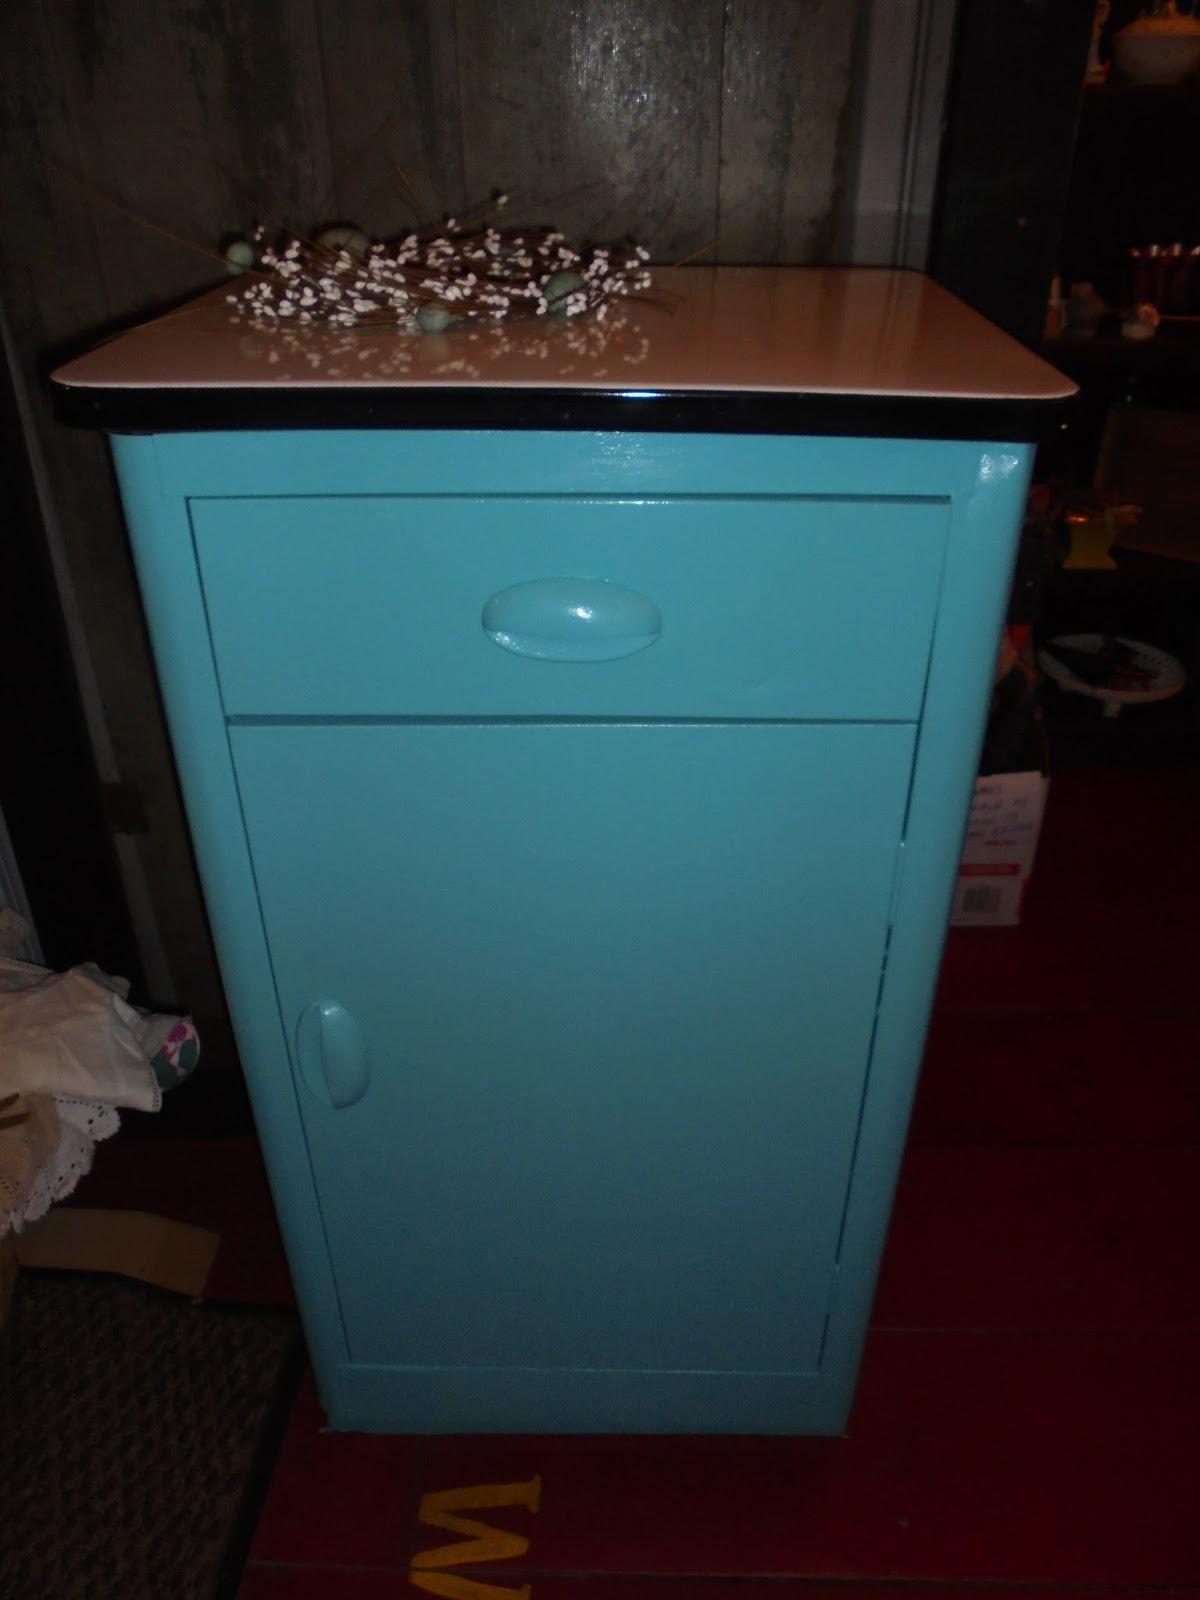 Log Cabin Antiques & Gifts: Enamel top kitchen cabinet